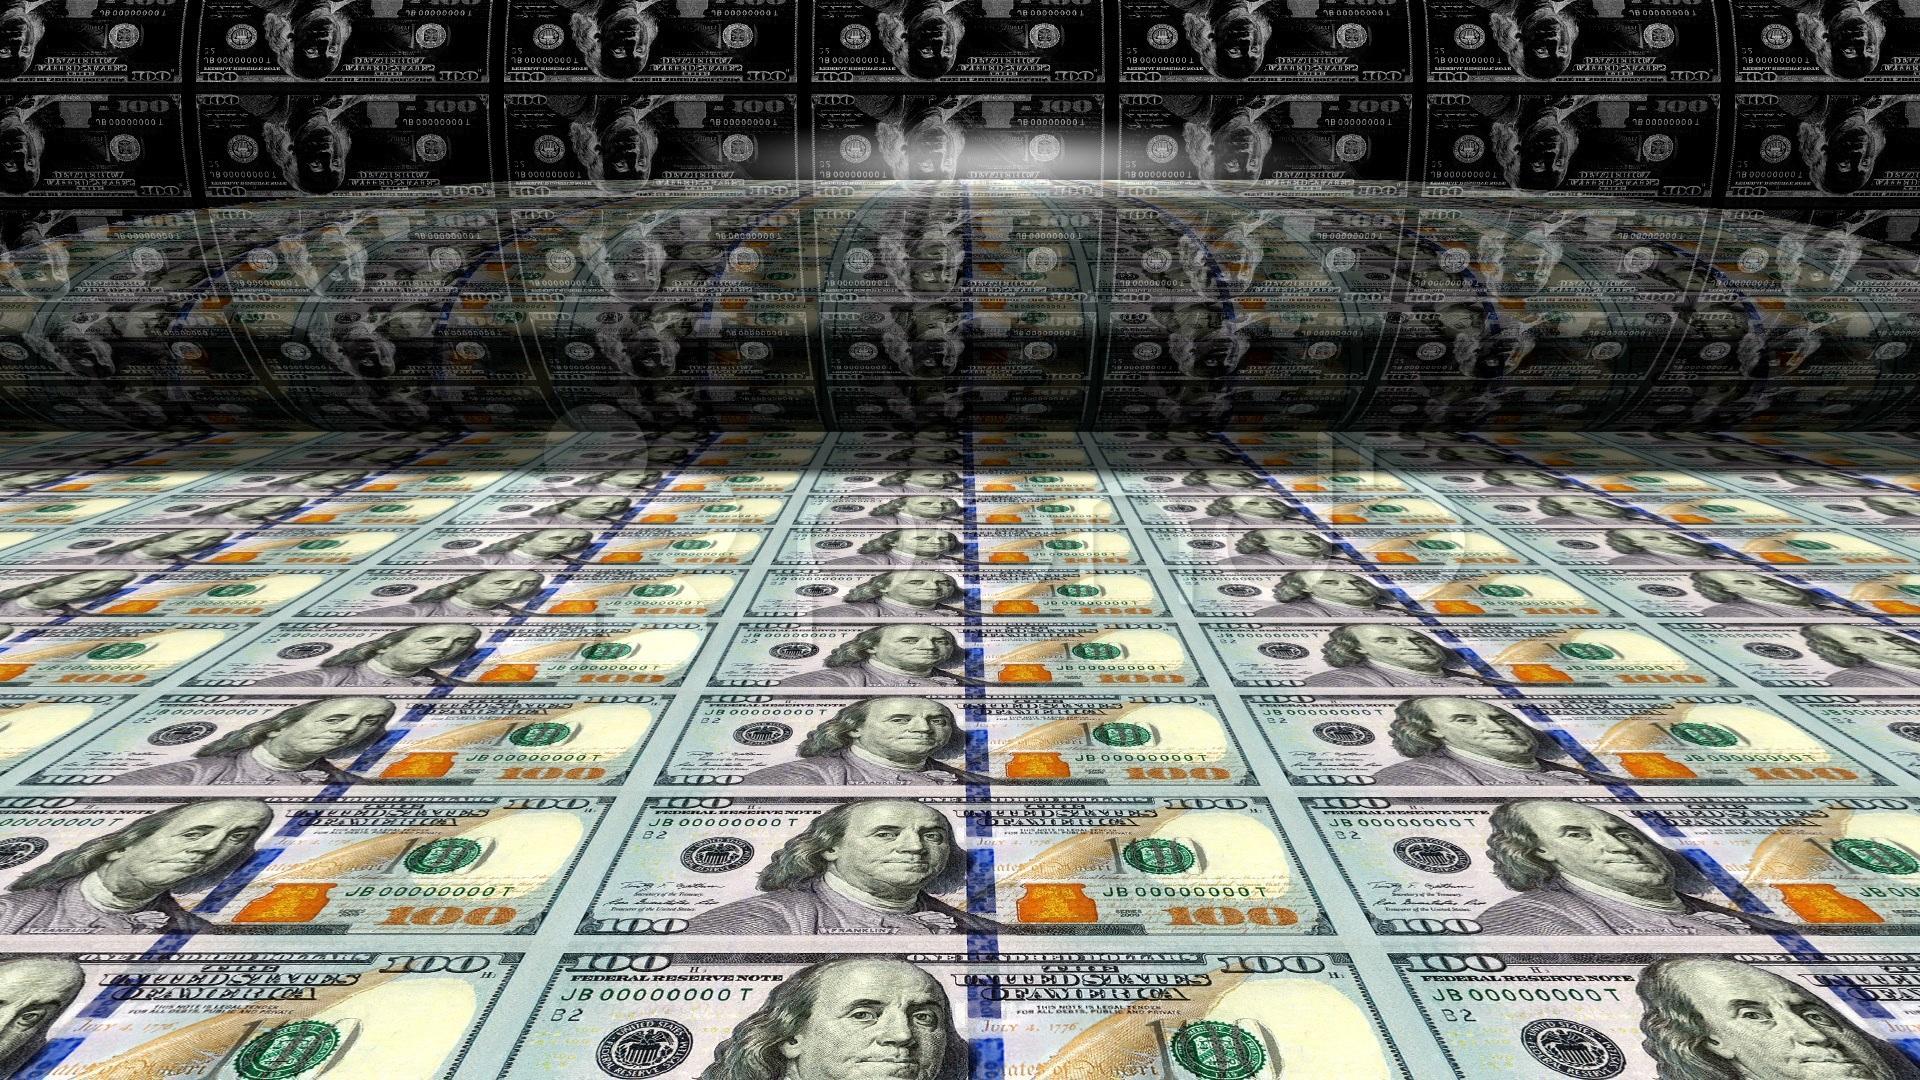 "A pesar de las advertencias de la sucursal de St. Louis, la Fed de Nueva York inyecta $ 108 mil millones en la economía estadounidense ""ancho ="" 1920 ""height ="" 1080 ""srcset ="" https://blackswanfinances.com/wp-content/uploads/2019/11/many-dollars-paper-currency-printing_1920x1080.jpg 1920w, https: //news.bitcoin. com / wp-content / uploads / 2019/11 / many-dollars-paper-currency-printing_1920x1080-300x169.jpg 300w, https://news.bitcoin.com/wp-content/uploads/2019/11/many-dollars -paper-currency-printing_1920x1080-1024x576.jpg 1024w, https://news.bitcoin.com/wp-content/uploads/2019/11/many-dollars-paper-currency-printing_1920x1080-768x432.jpg 768w, https: / /news.bitcoin.com/wp-content/uploads/2019/11/many-dollars-paper-currency-printing_1920x1080-1536x864.jpg 1536w, https://news.bitcoin.com/wp-content/uploads/2019/ 11 / many-dollars-paper-currency-printing_1920x1080-696x392.jpg 696w, https://news.bitcoin.com/wp-content/uploads/2019/11/many-doll ars-paper-currency-printing_1920x1080-1392x783.jpg 1392w, https://news.bitcoin.com/wp-content/uploads/2019/11/many-dollars-paper-currency-printing_1920x1080-1068x601.jpg 1068w, https: //news.bitcoin.com/wp-content/uploads/2019/11/many-dollars-paper-currency-printing_1920x1080-747x420.jpg 747w ""tamaños ="" (ancho máximo: 1920px) 100vw, 1920px"